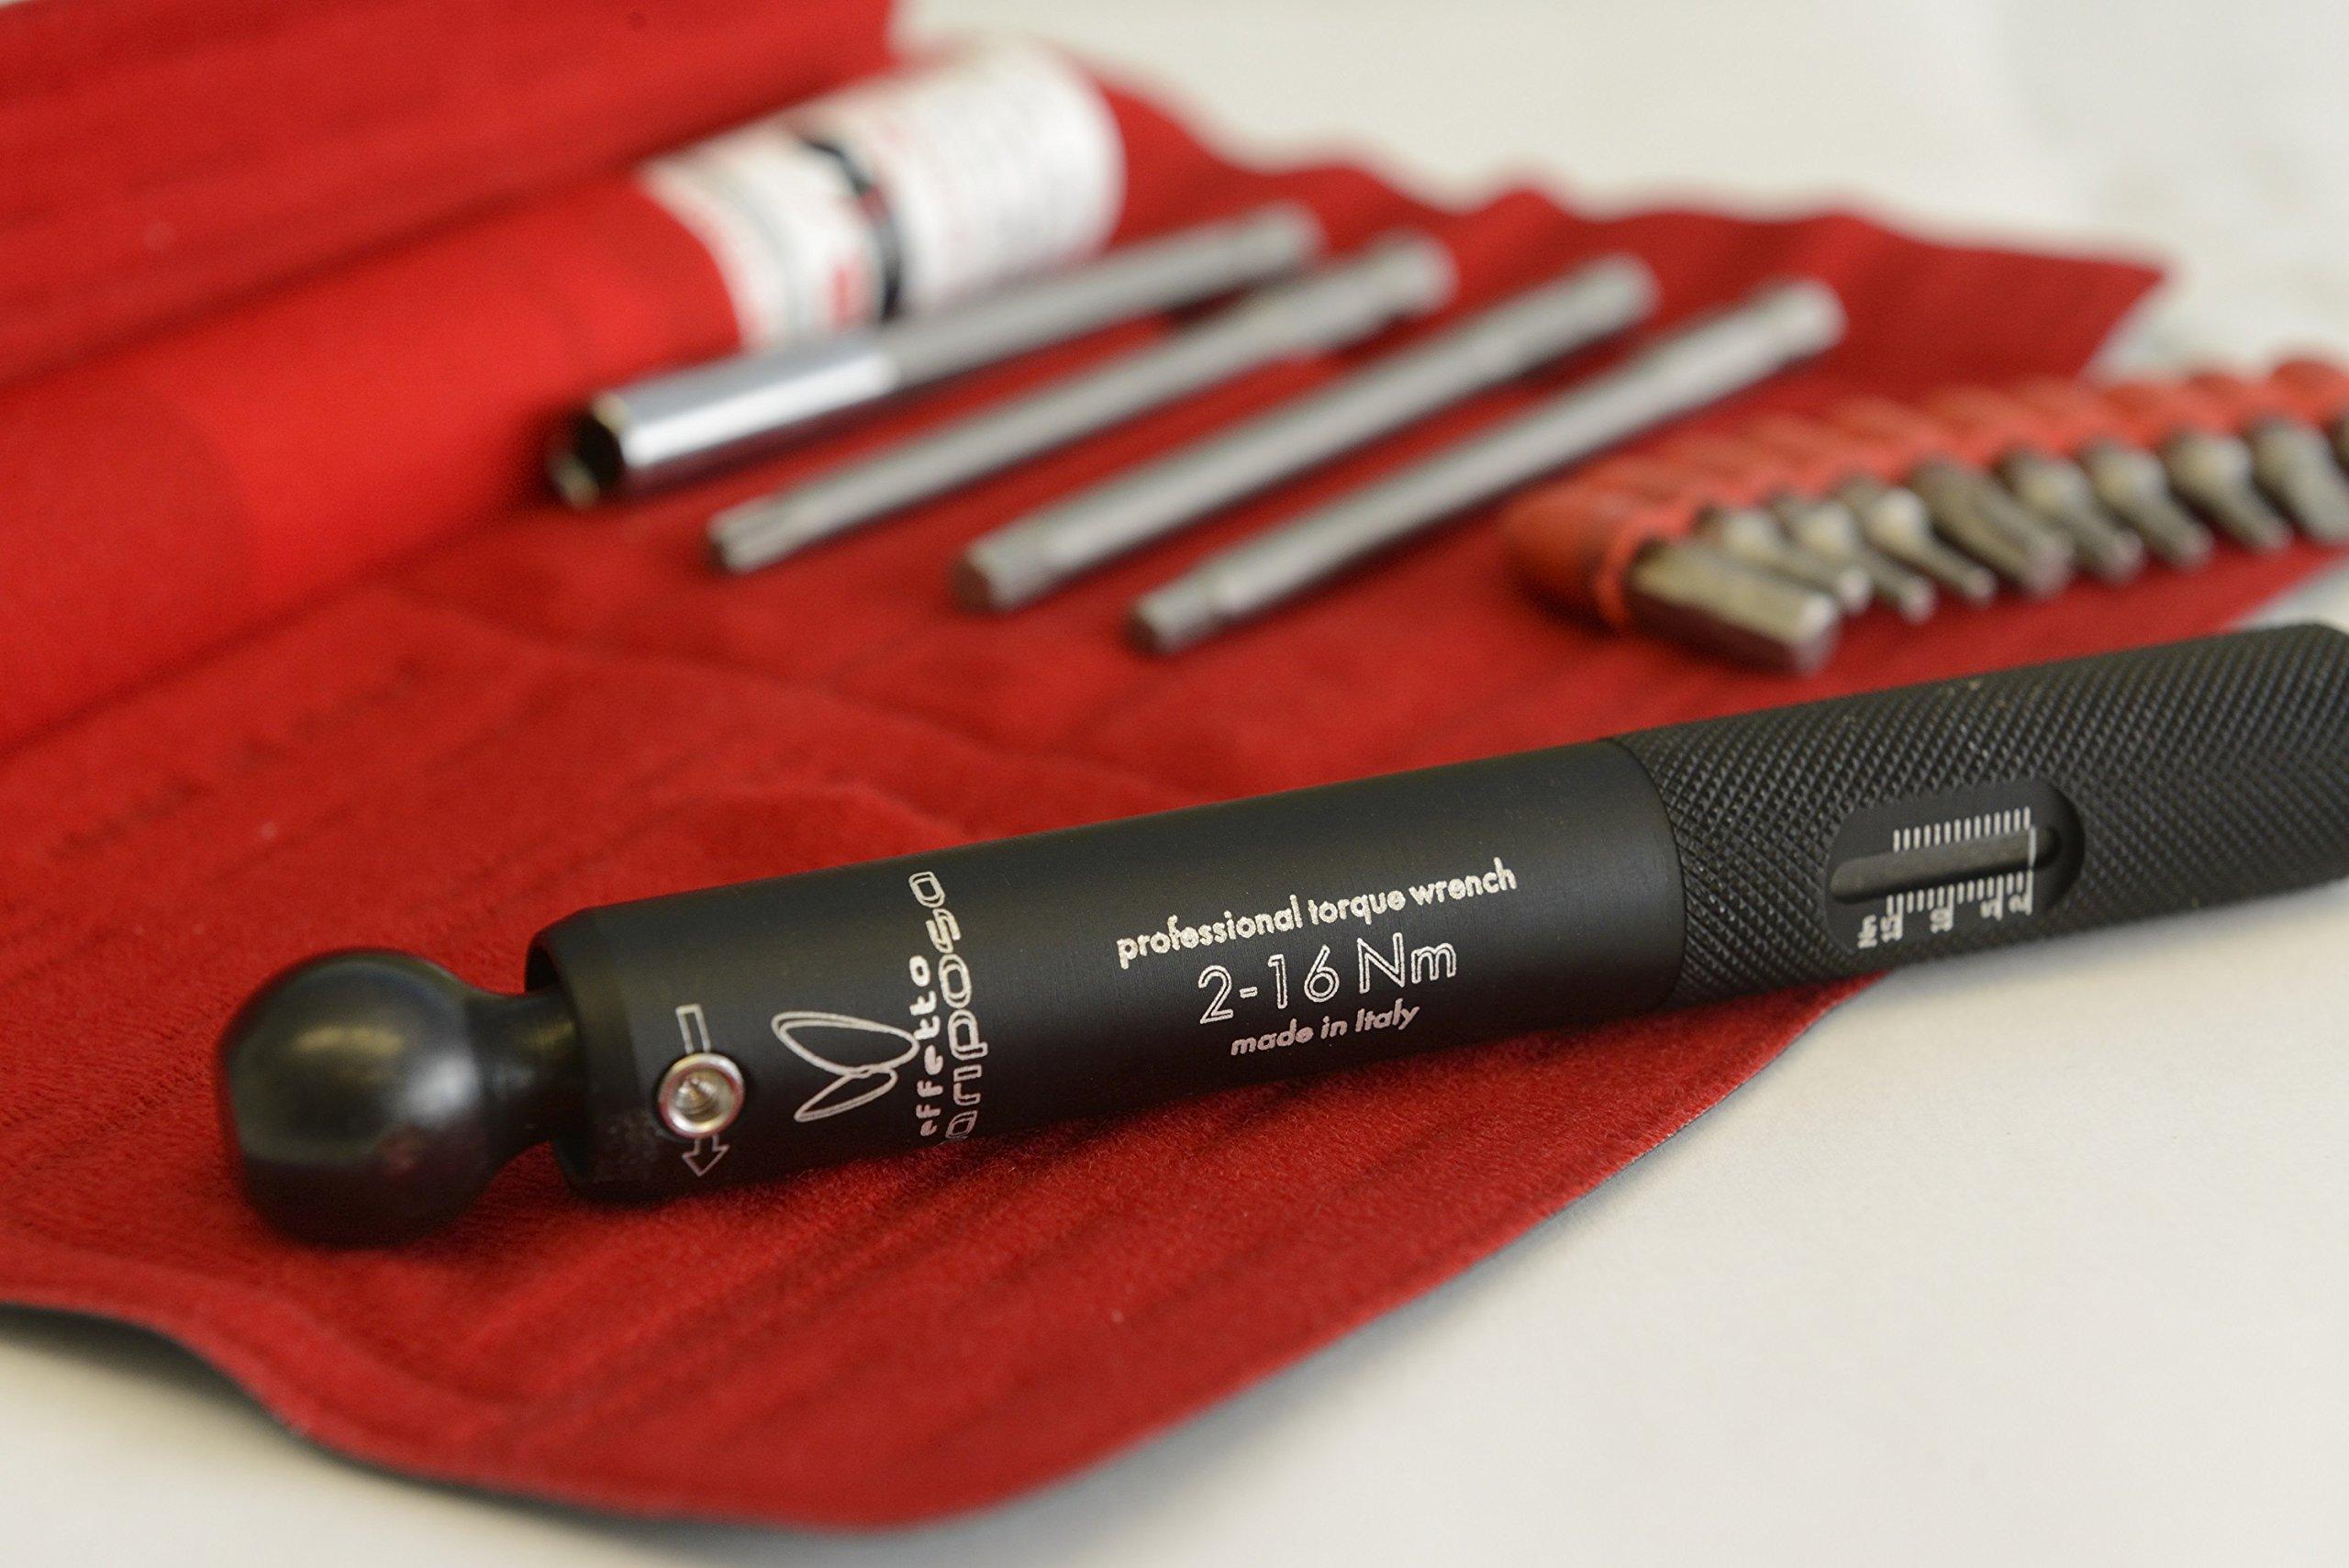 Giustaforza II 2-16 Torque Wrench BLACK